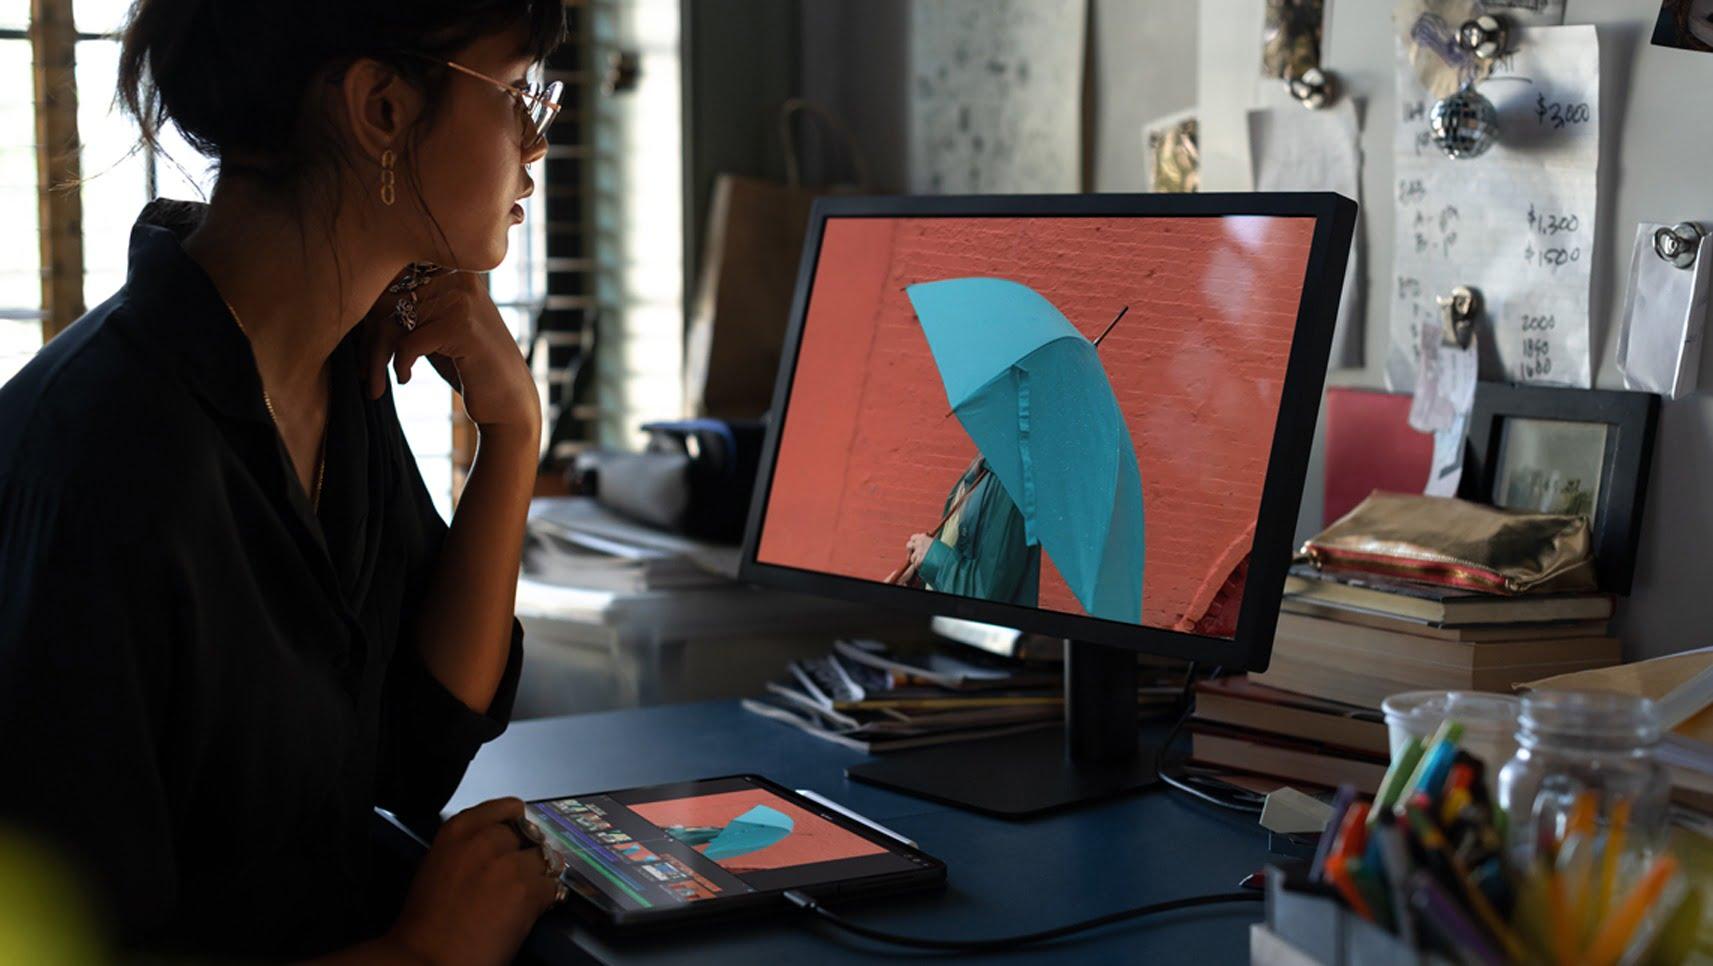 iPad Pro versatility monitor 10302018